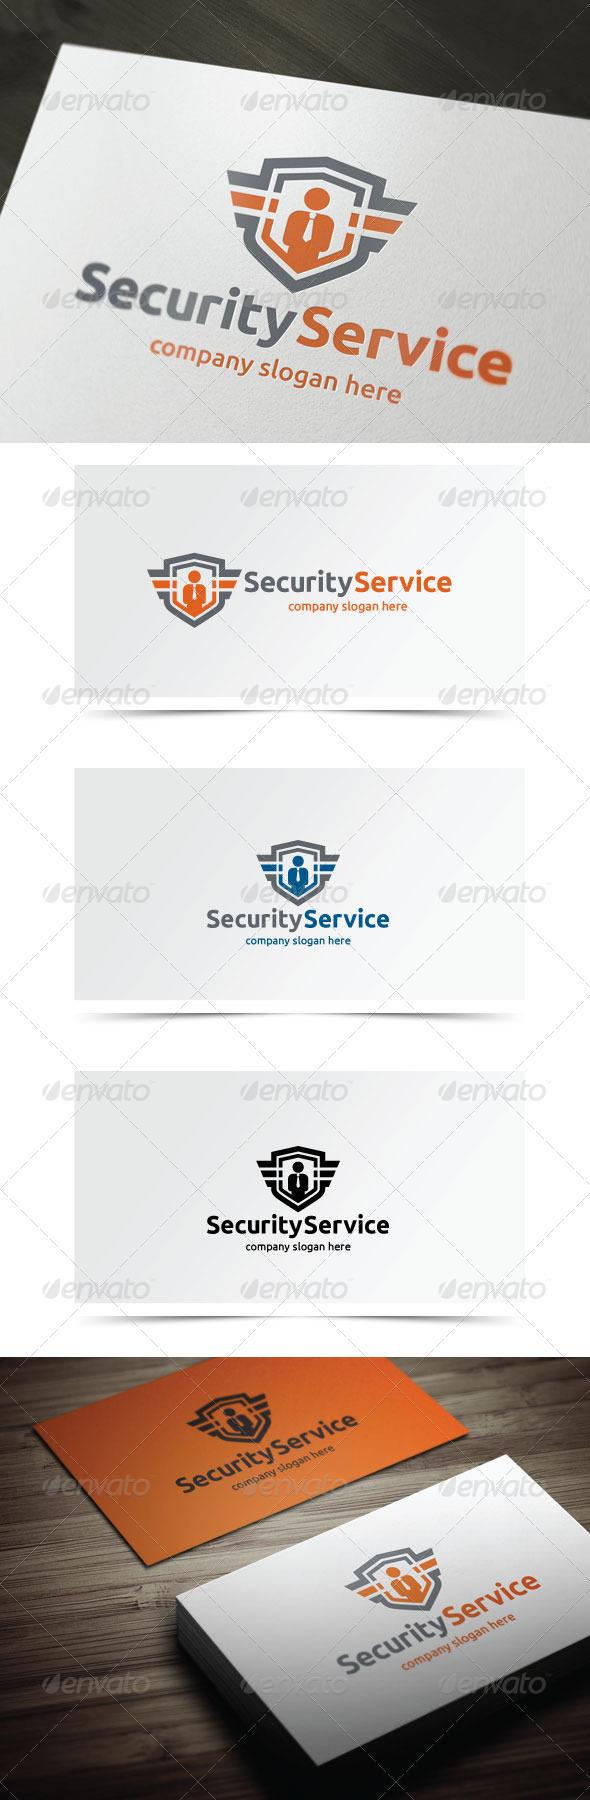 Security Service - Symbols Logo Templates